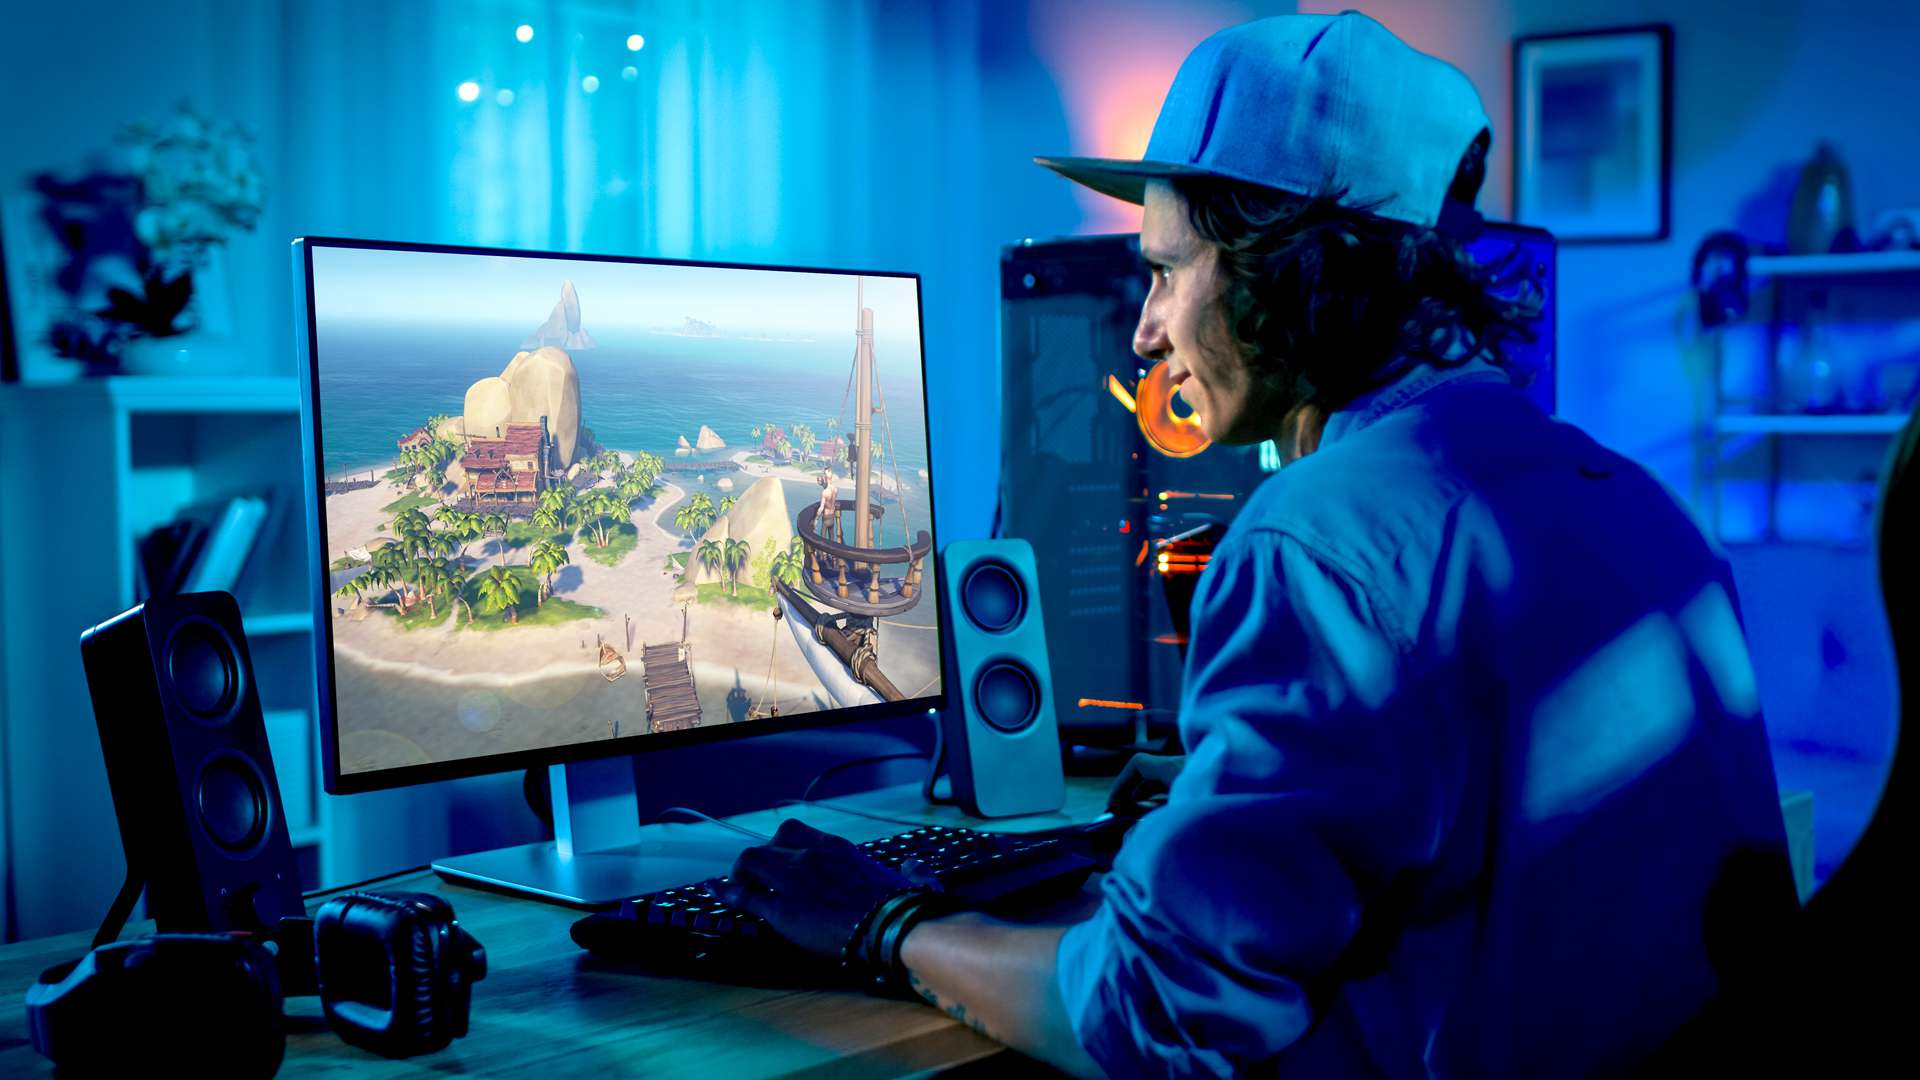 Contoh Latar Belakang Penelitian Game Online